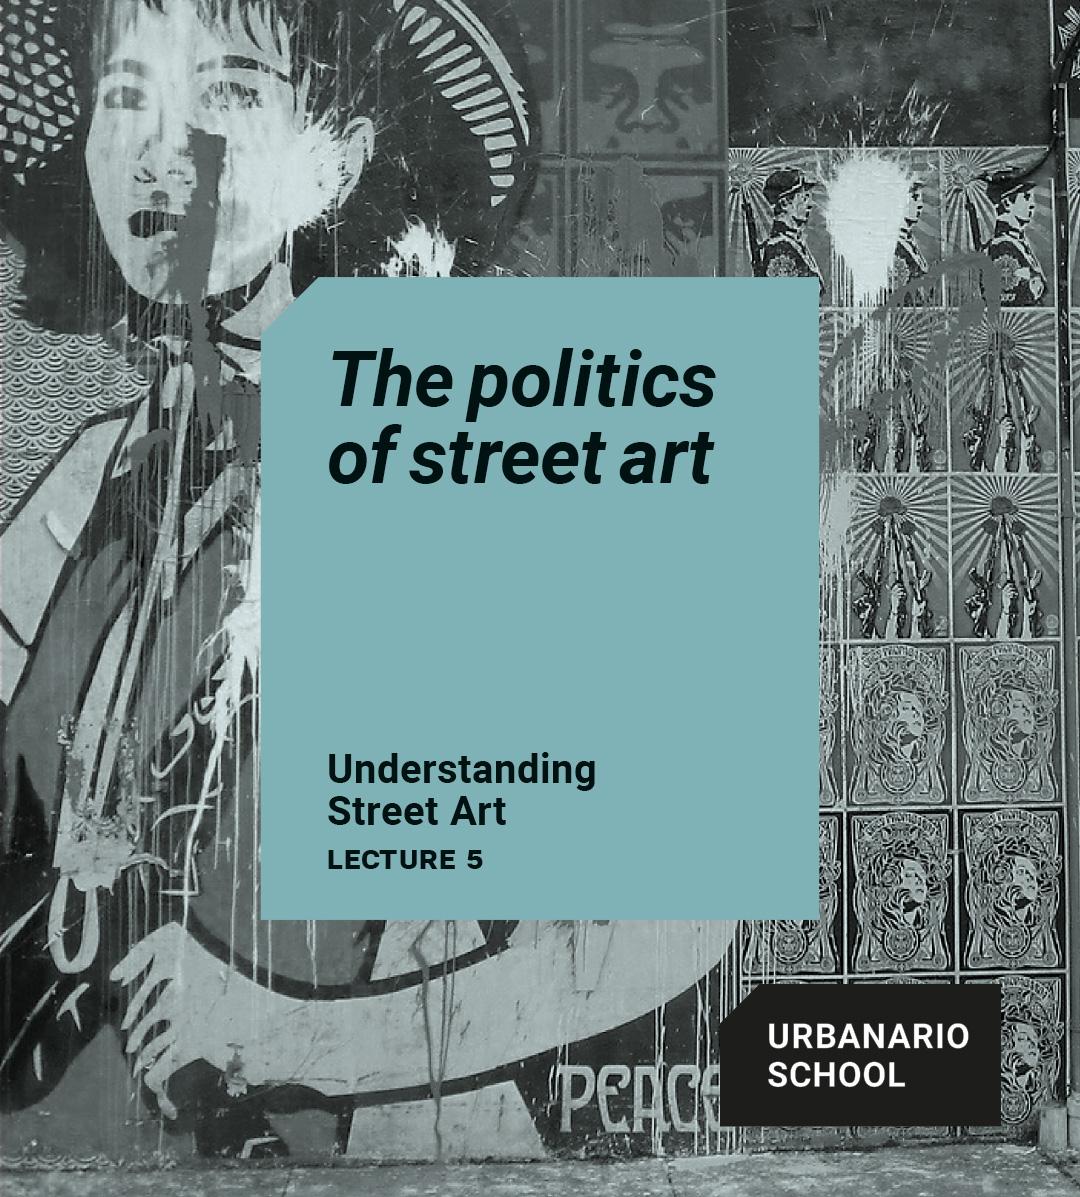 The politics of street art